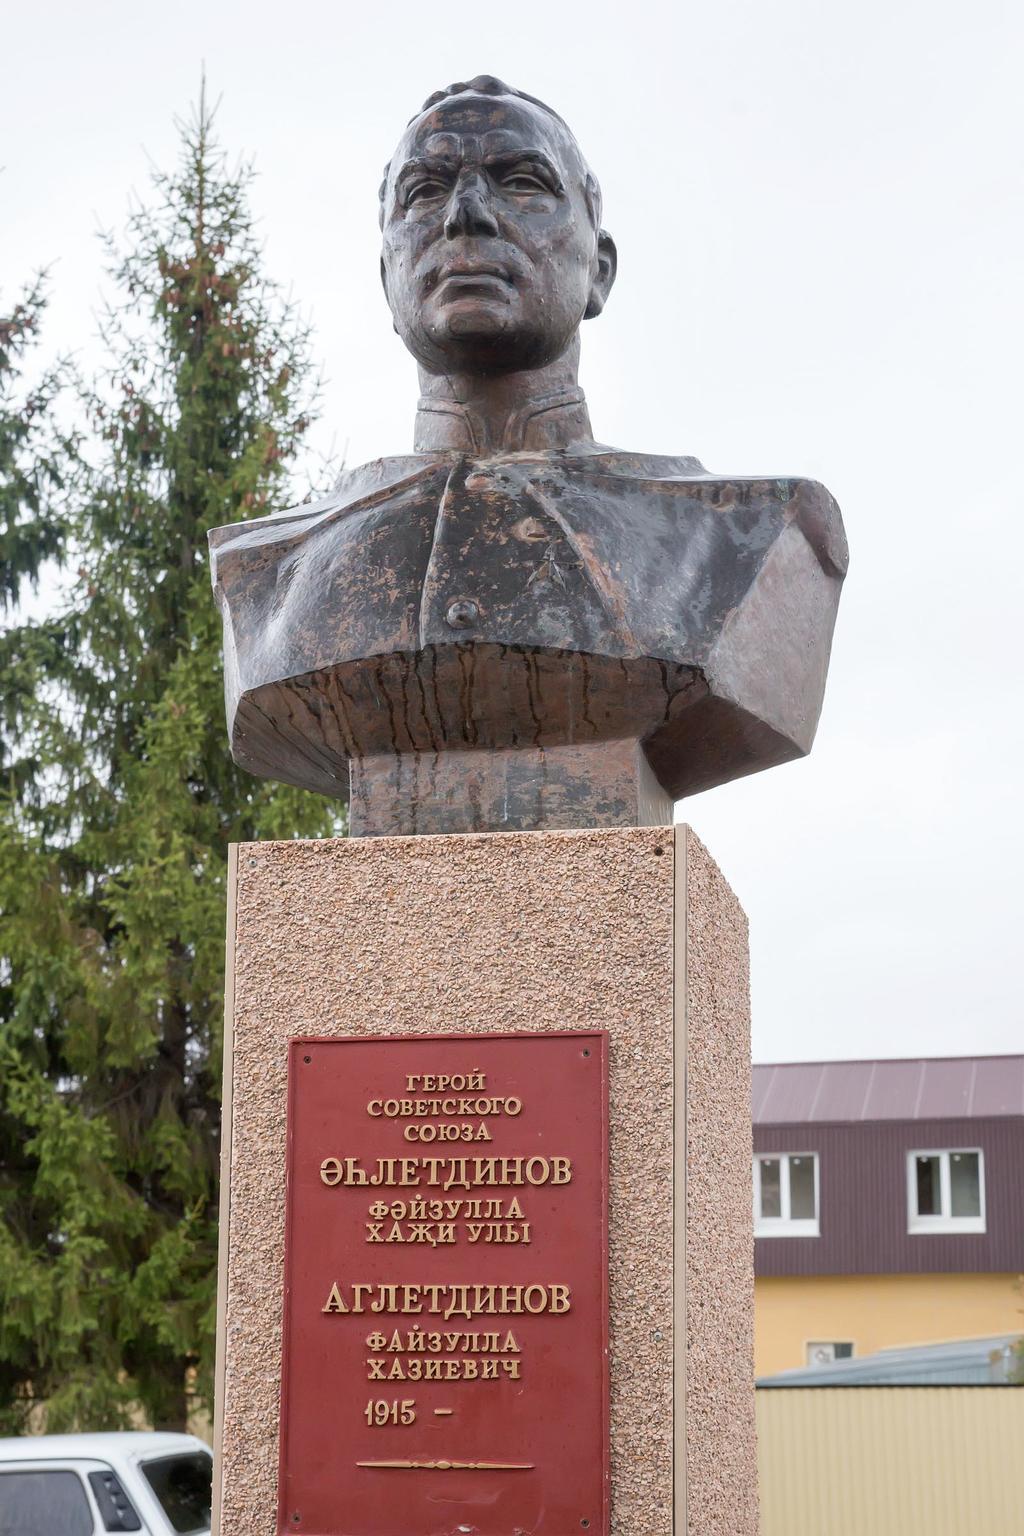 Аглетдинов Файзулла Хазиевич 1915, Герой Советского Союза ©Tatfrontu.ru Photo Archive